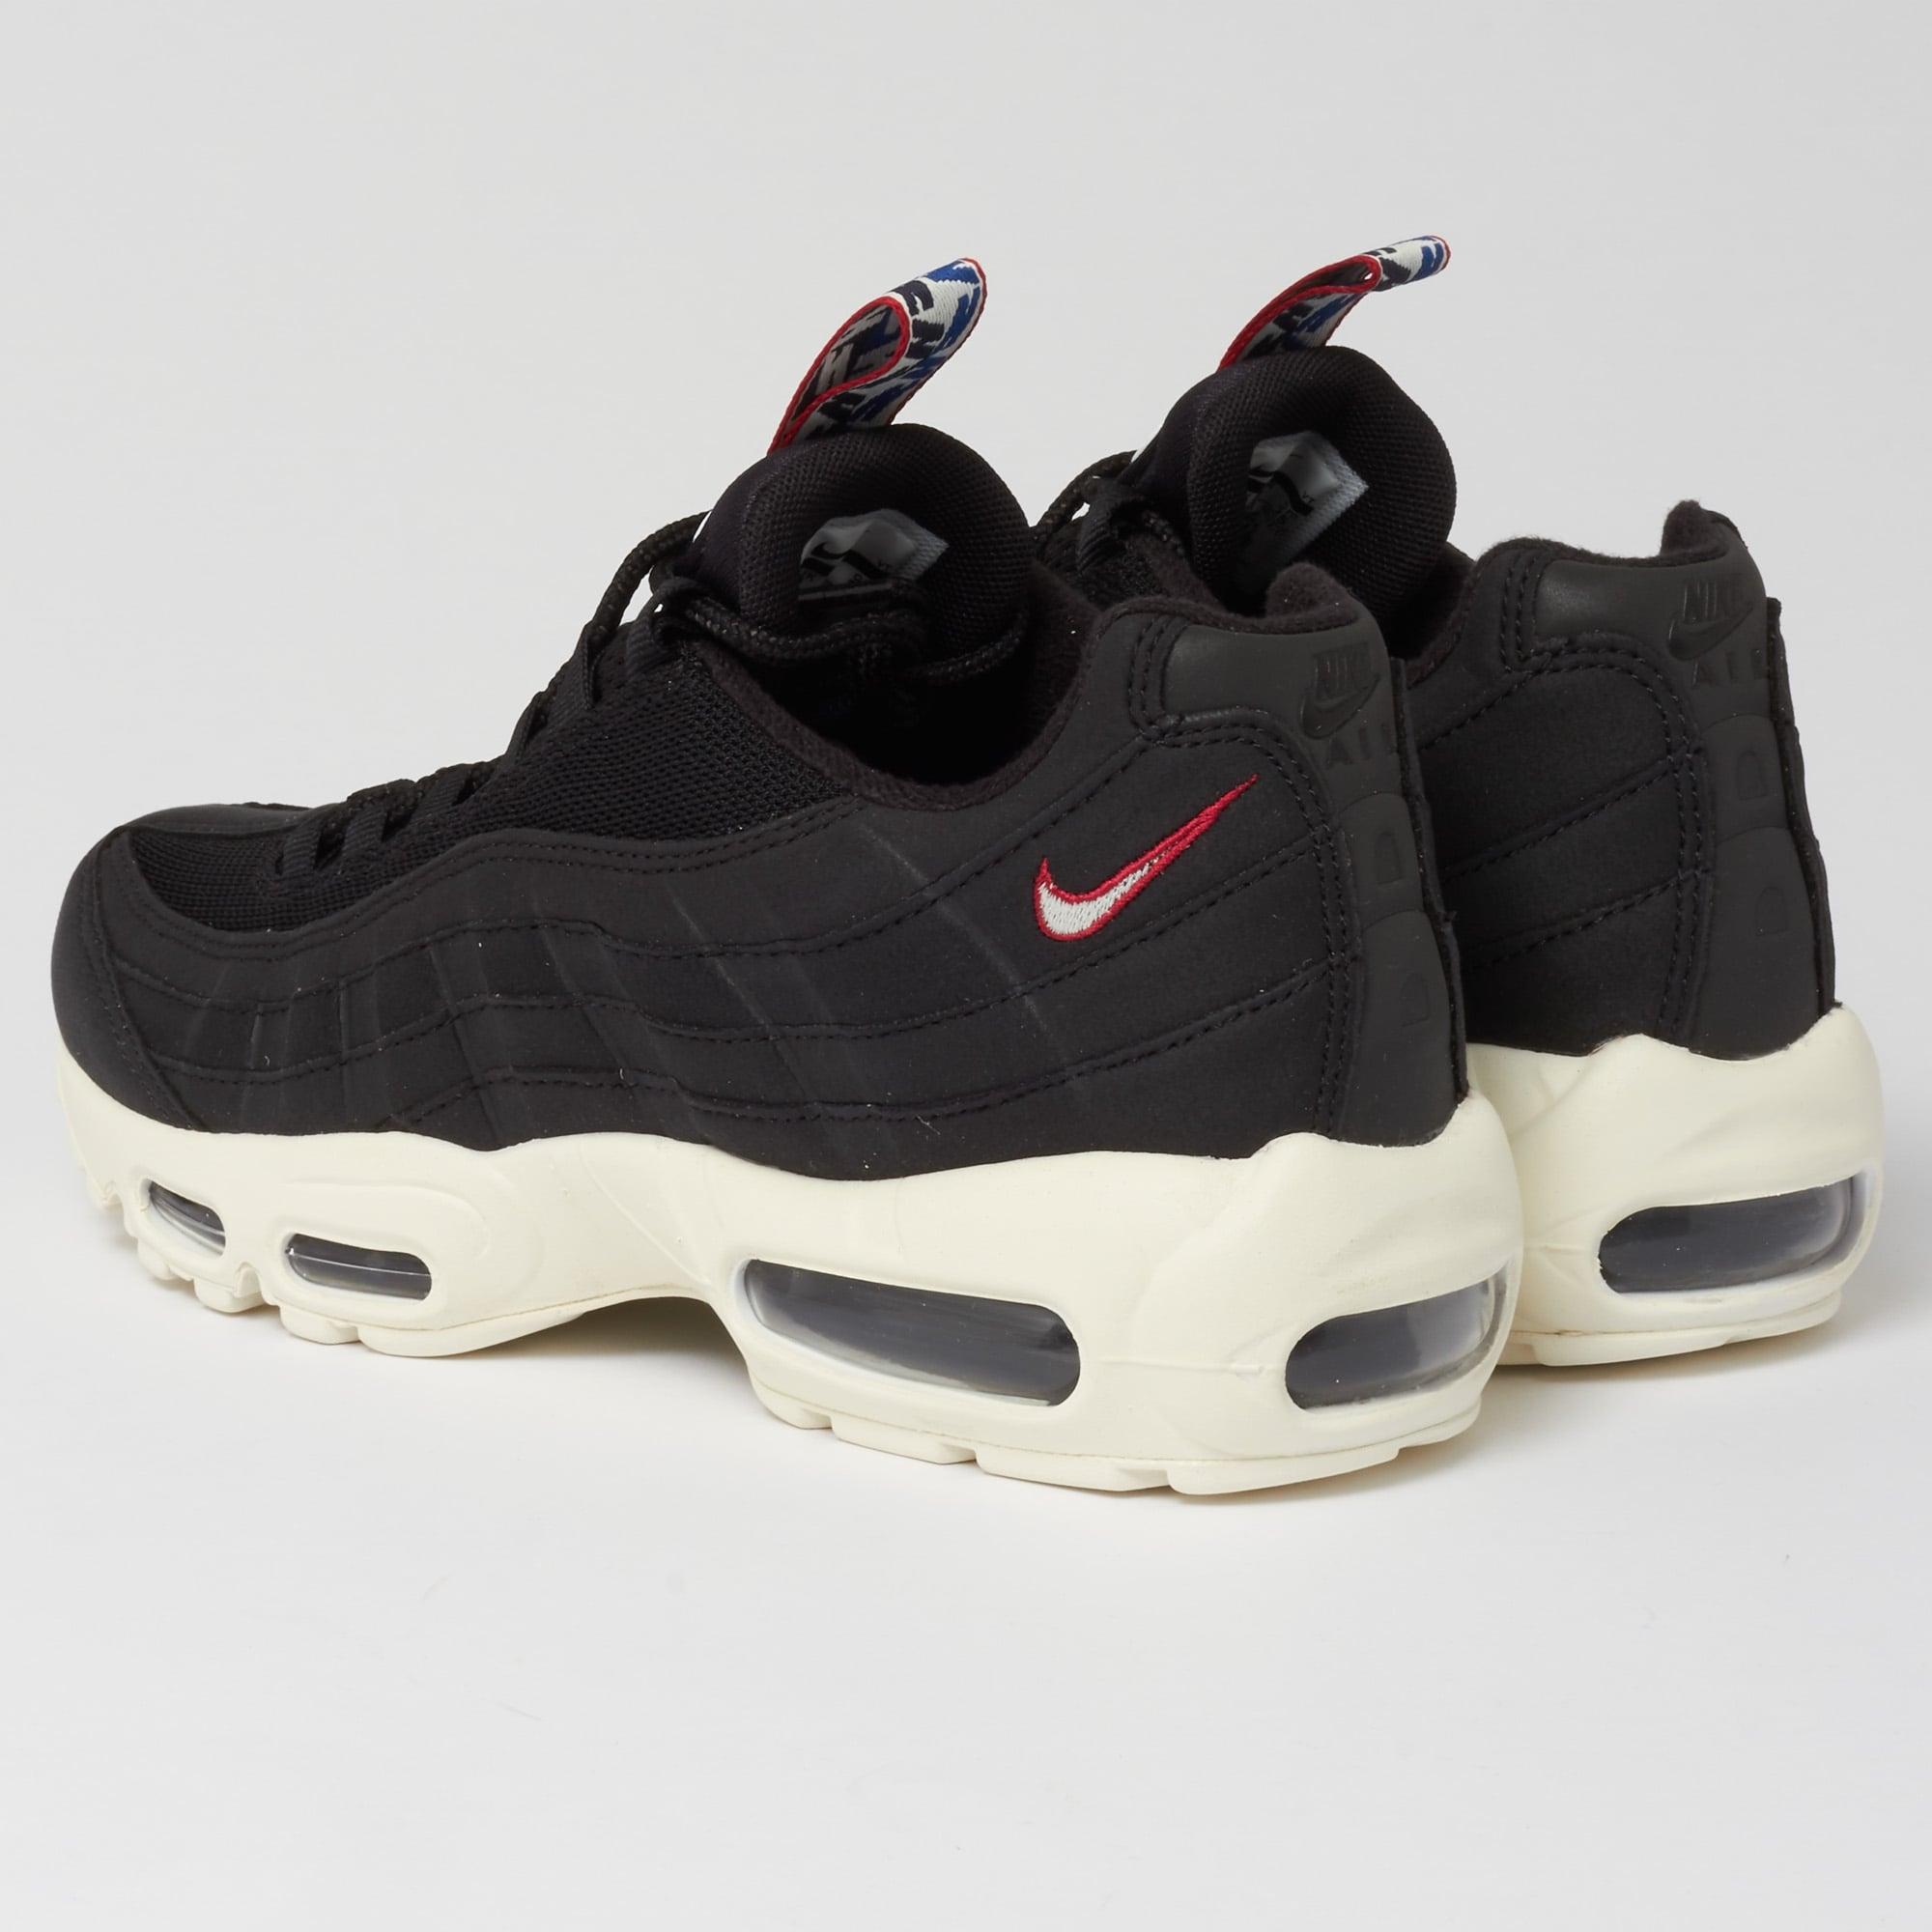 137d357251b nike air max 95 all black on feet nz